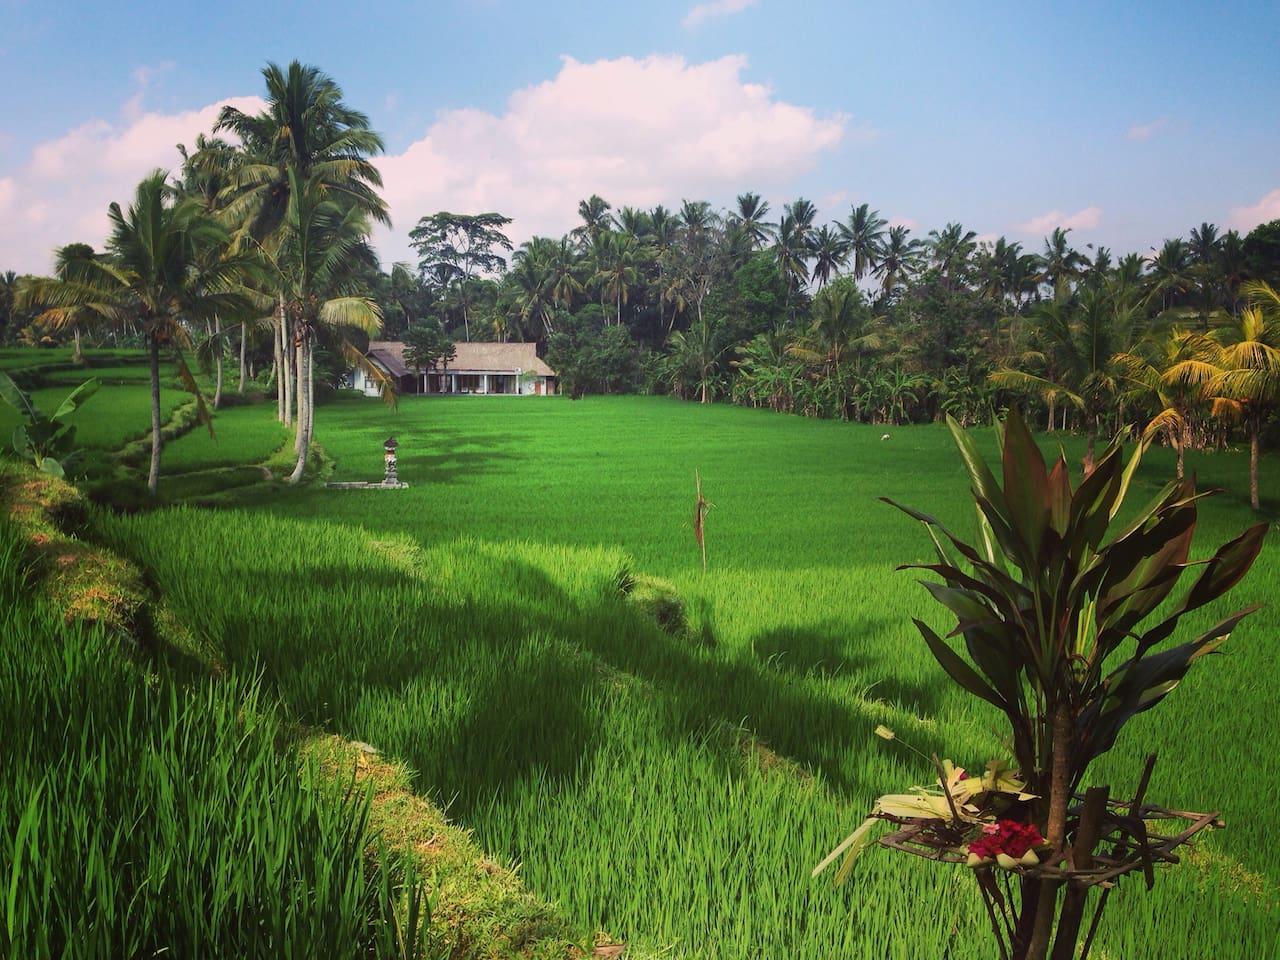 villa kerasan green view from  balinese subak temple